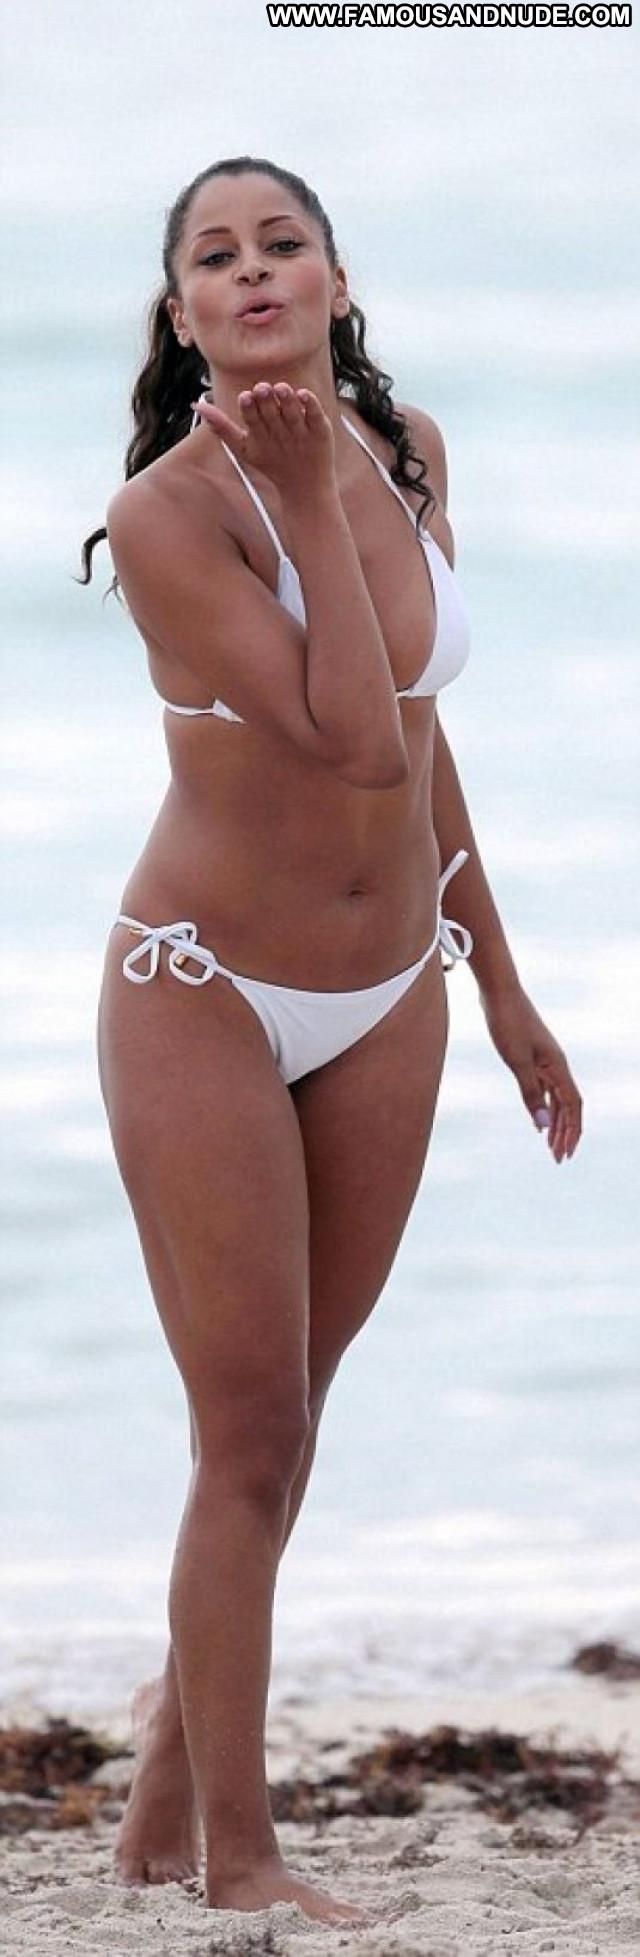 Claudia Jordan No Source Celebrity Beach Jordan Bikini Beautiful Babe